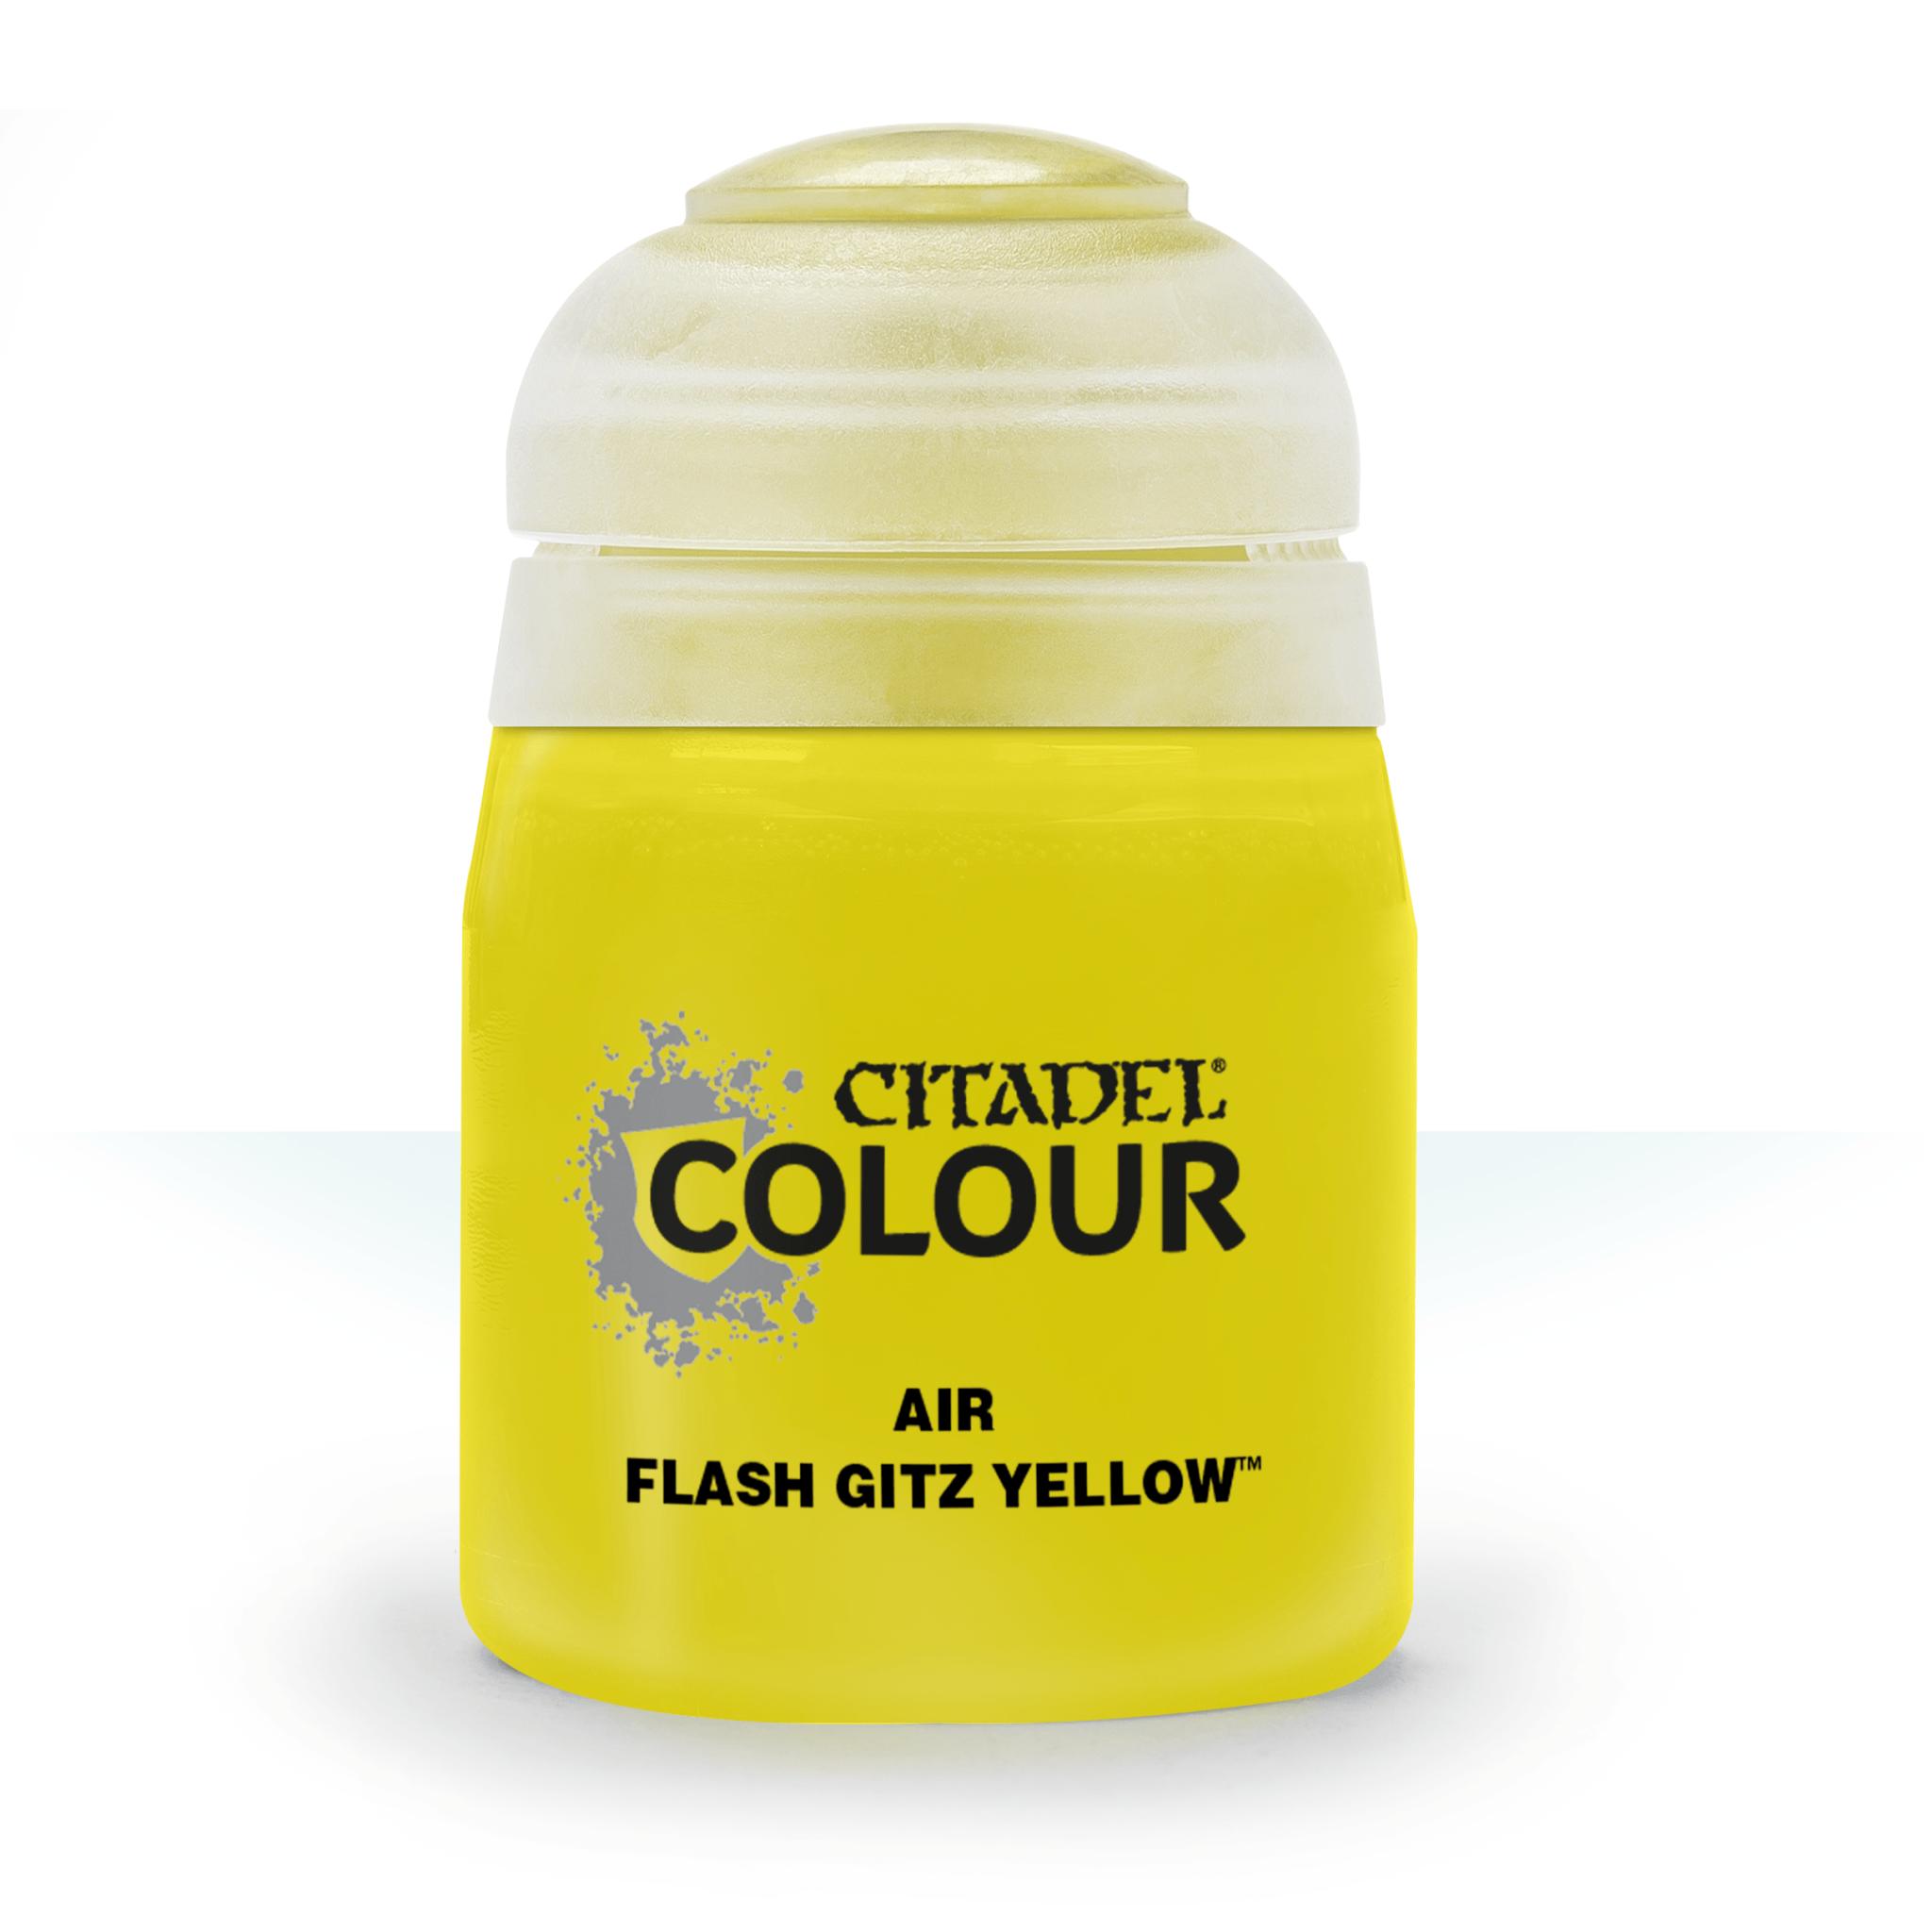 Flash Gitz Yellow (Air 24ml)